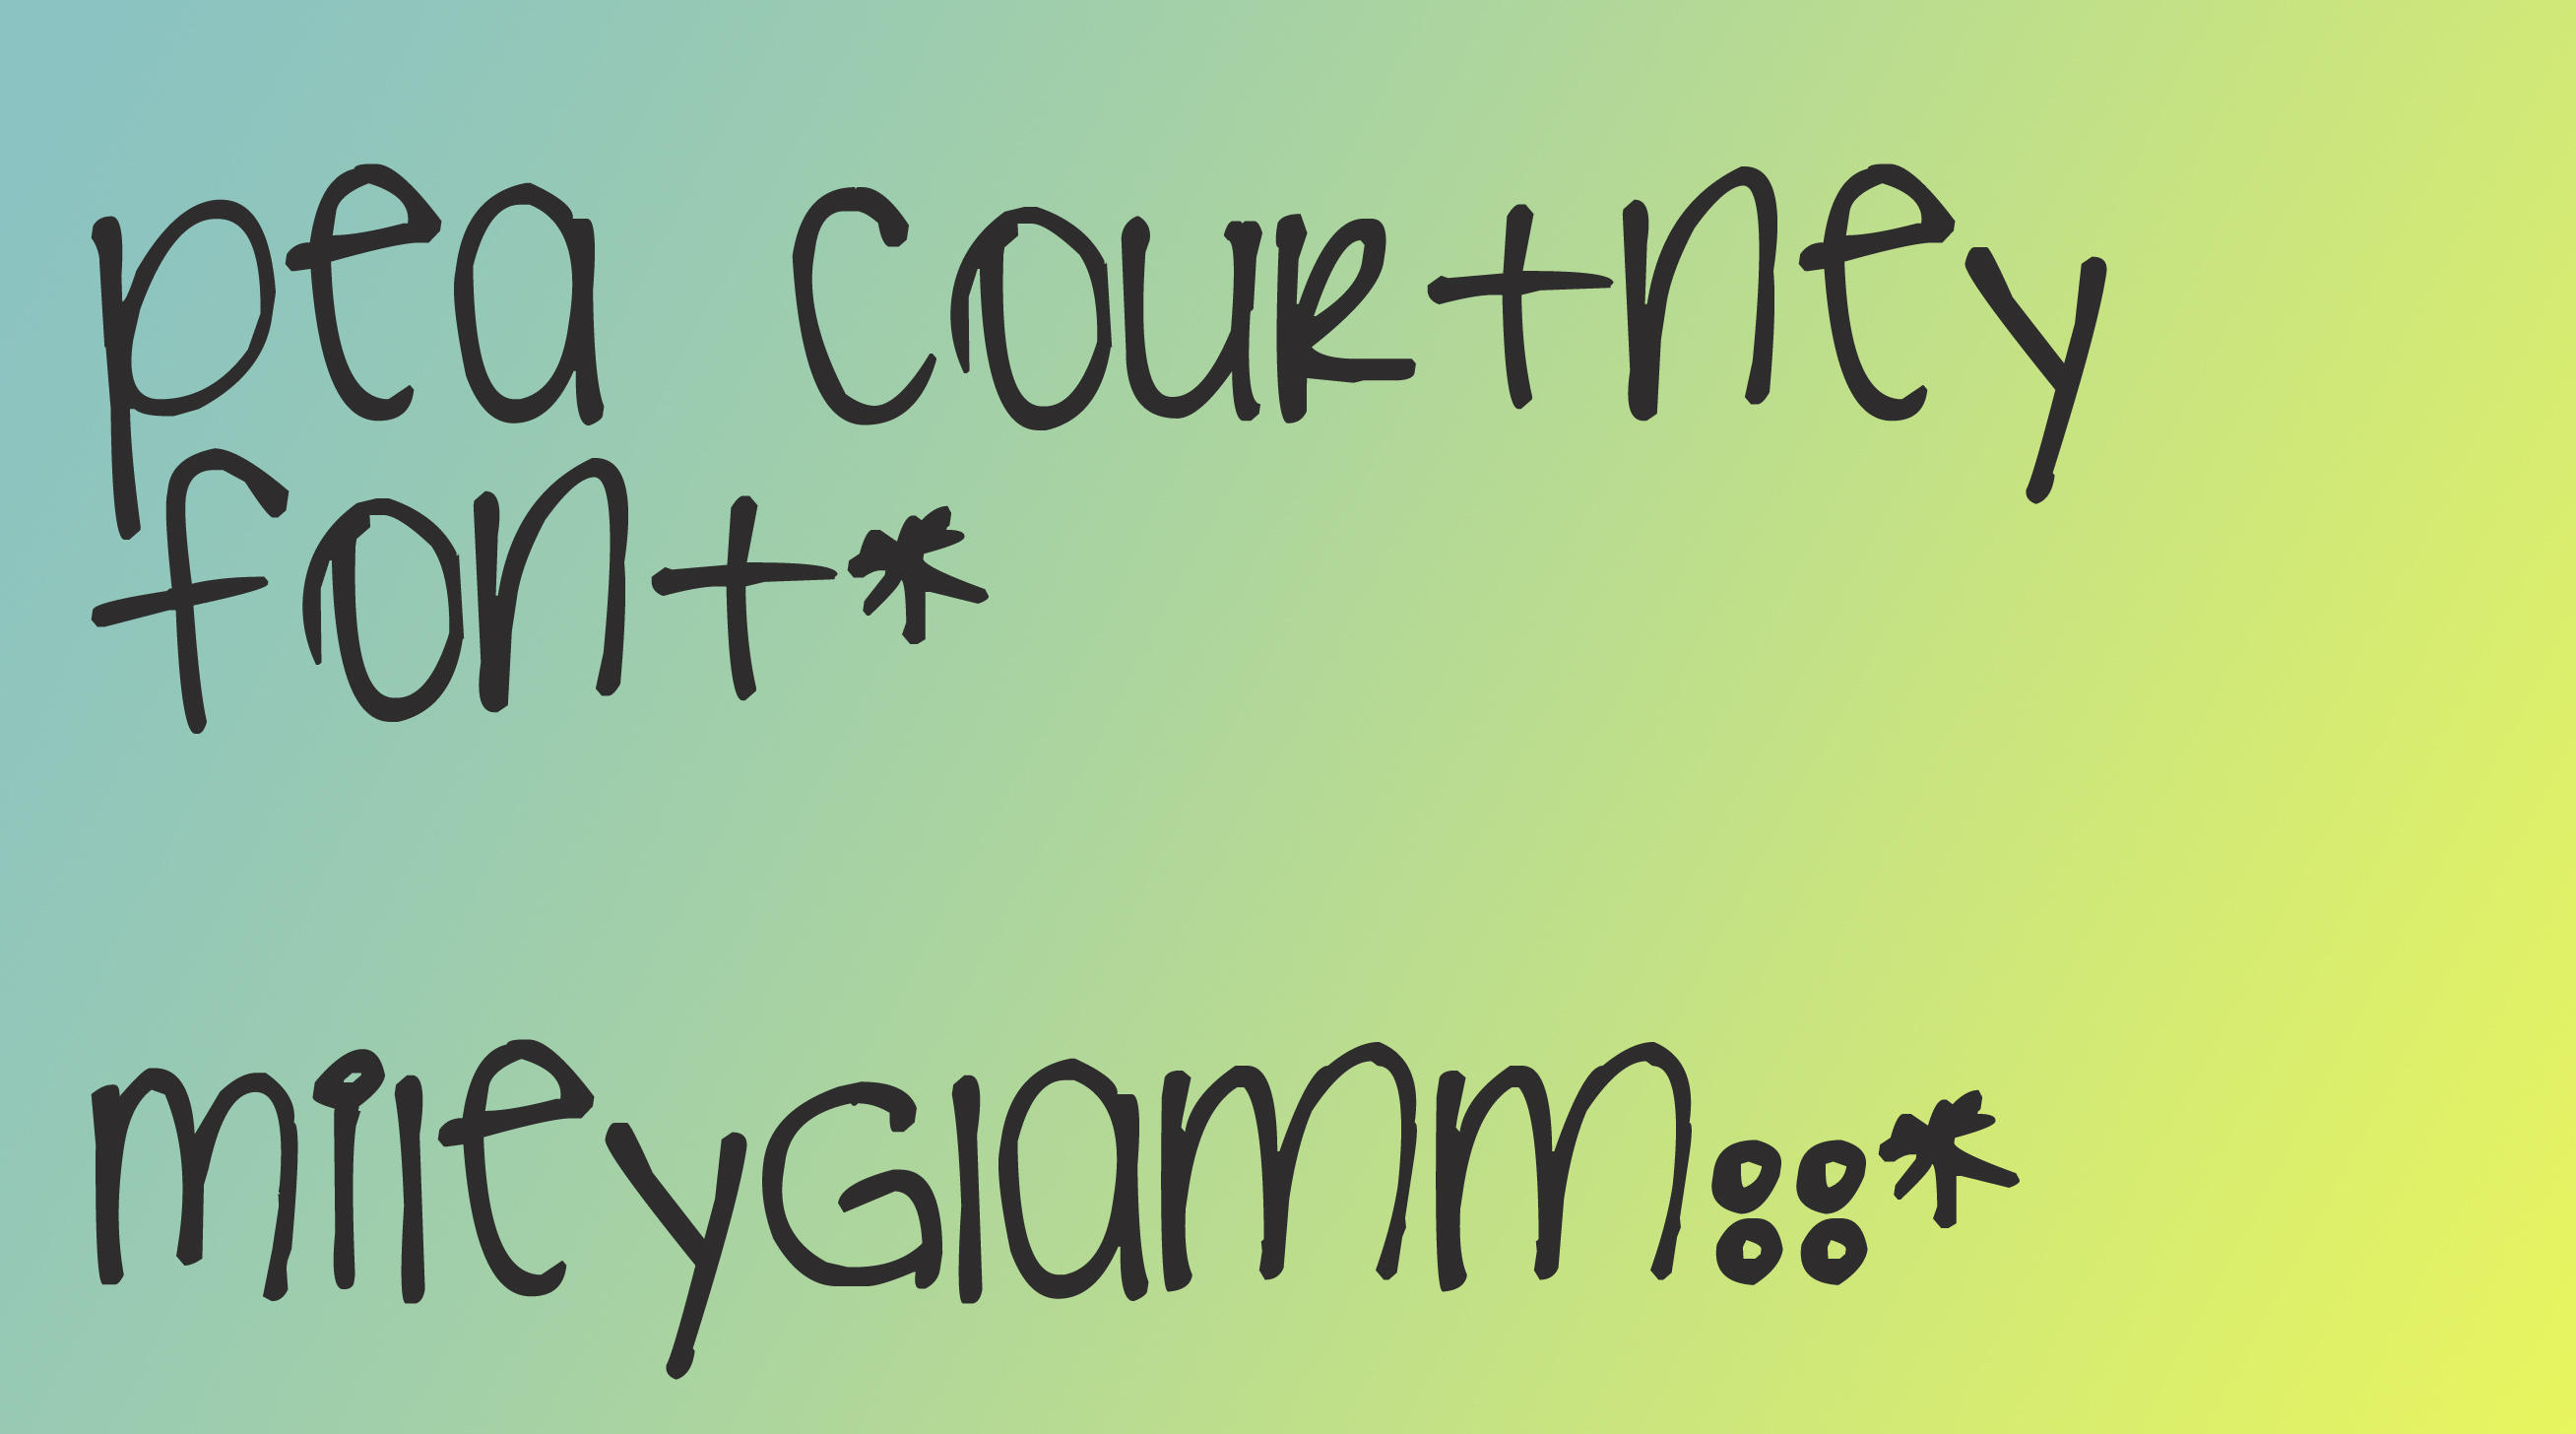 Pea Courtney Font by MileyGlamm